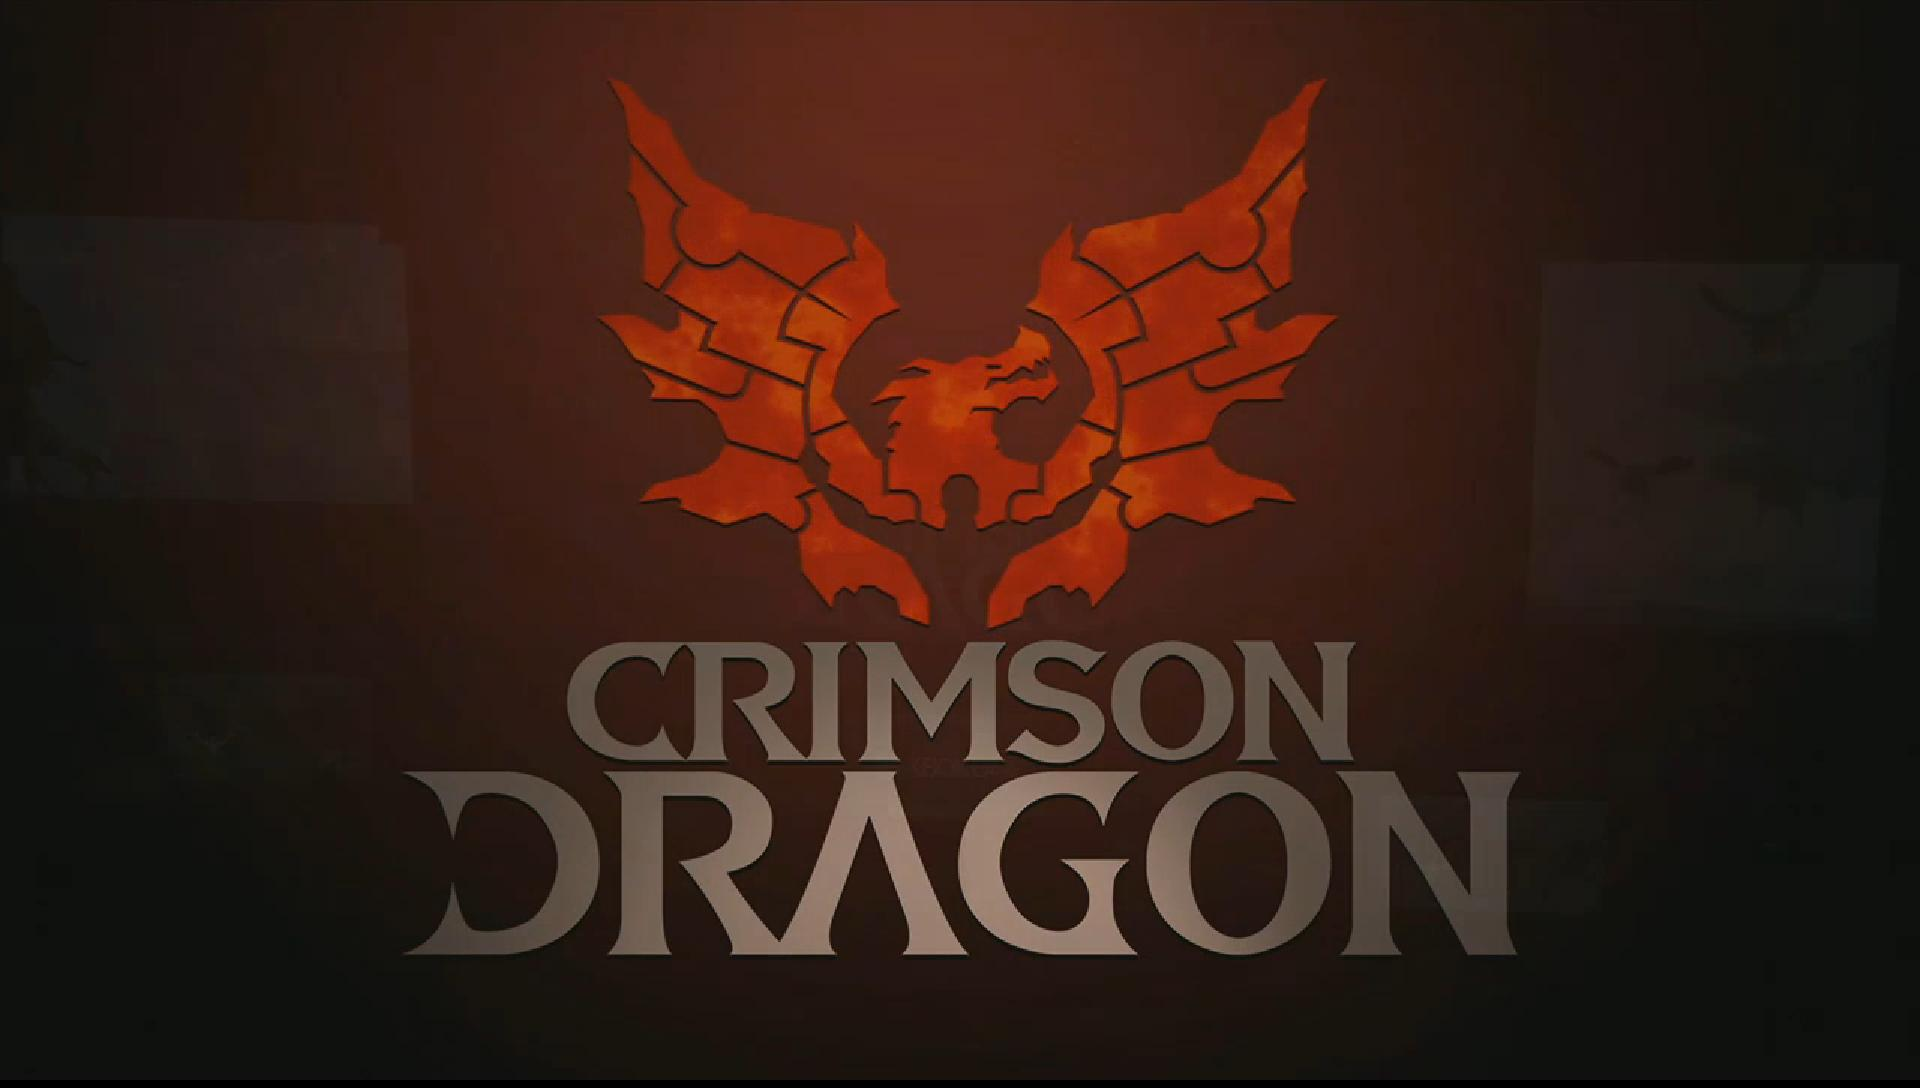 crimson dragon wallpaper - photo #2